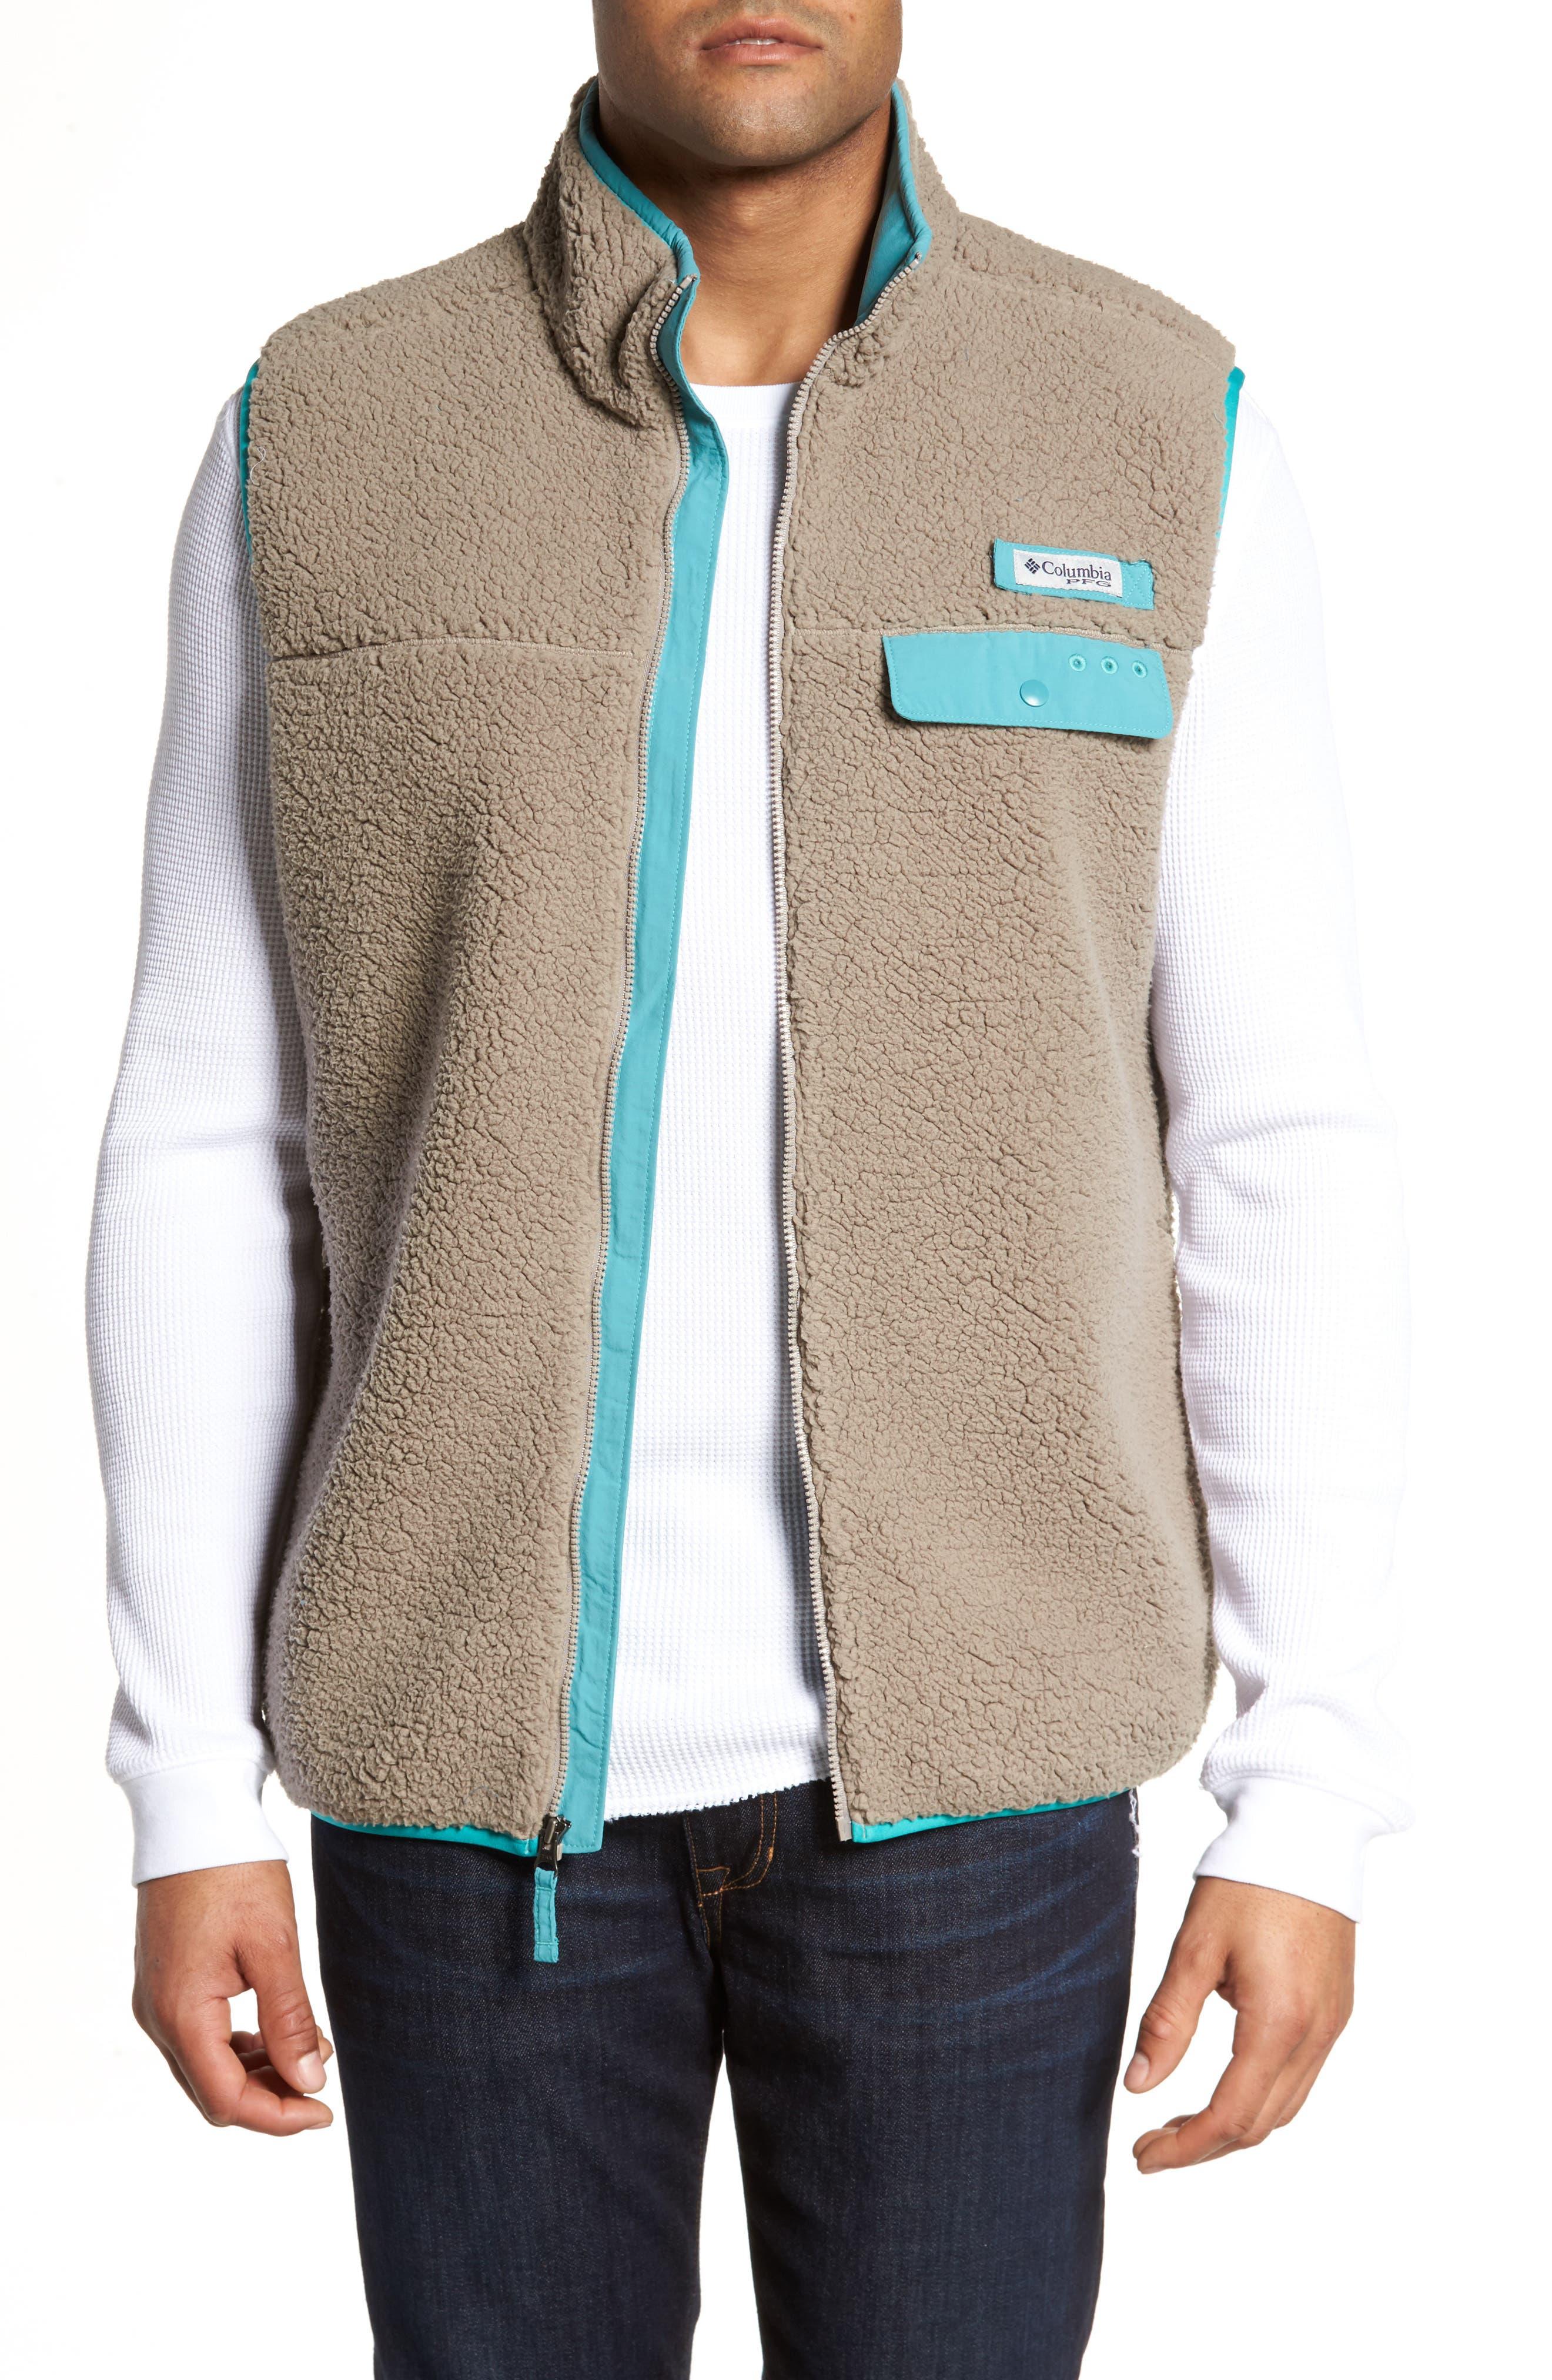 Alternate Image 1 Selected - Columbia Sportswear Harborside Heavyweight Fleece Vest